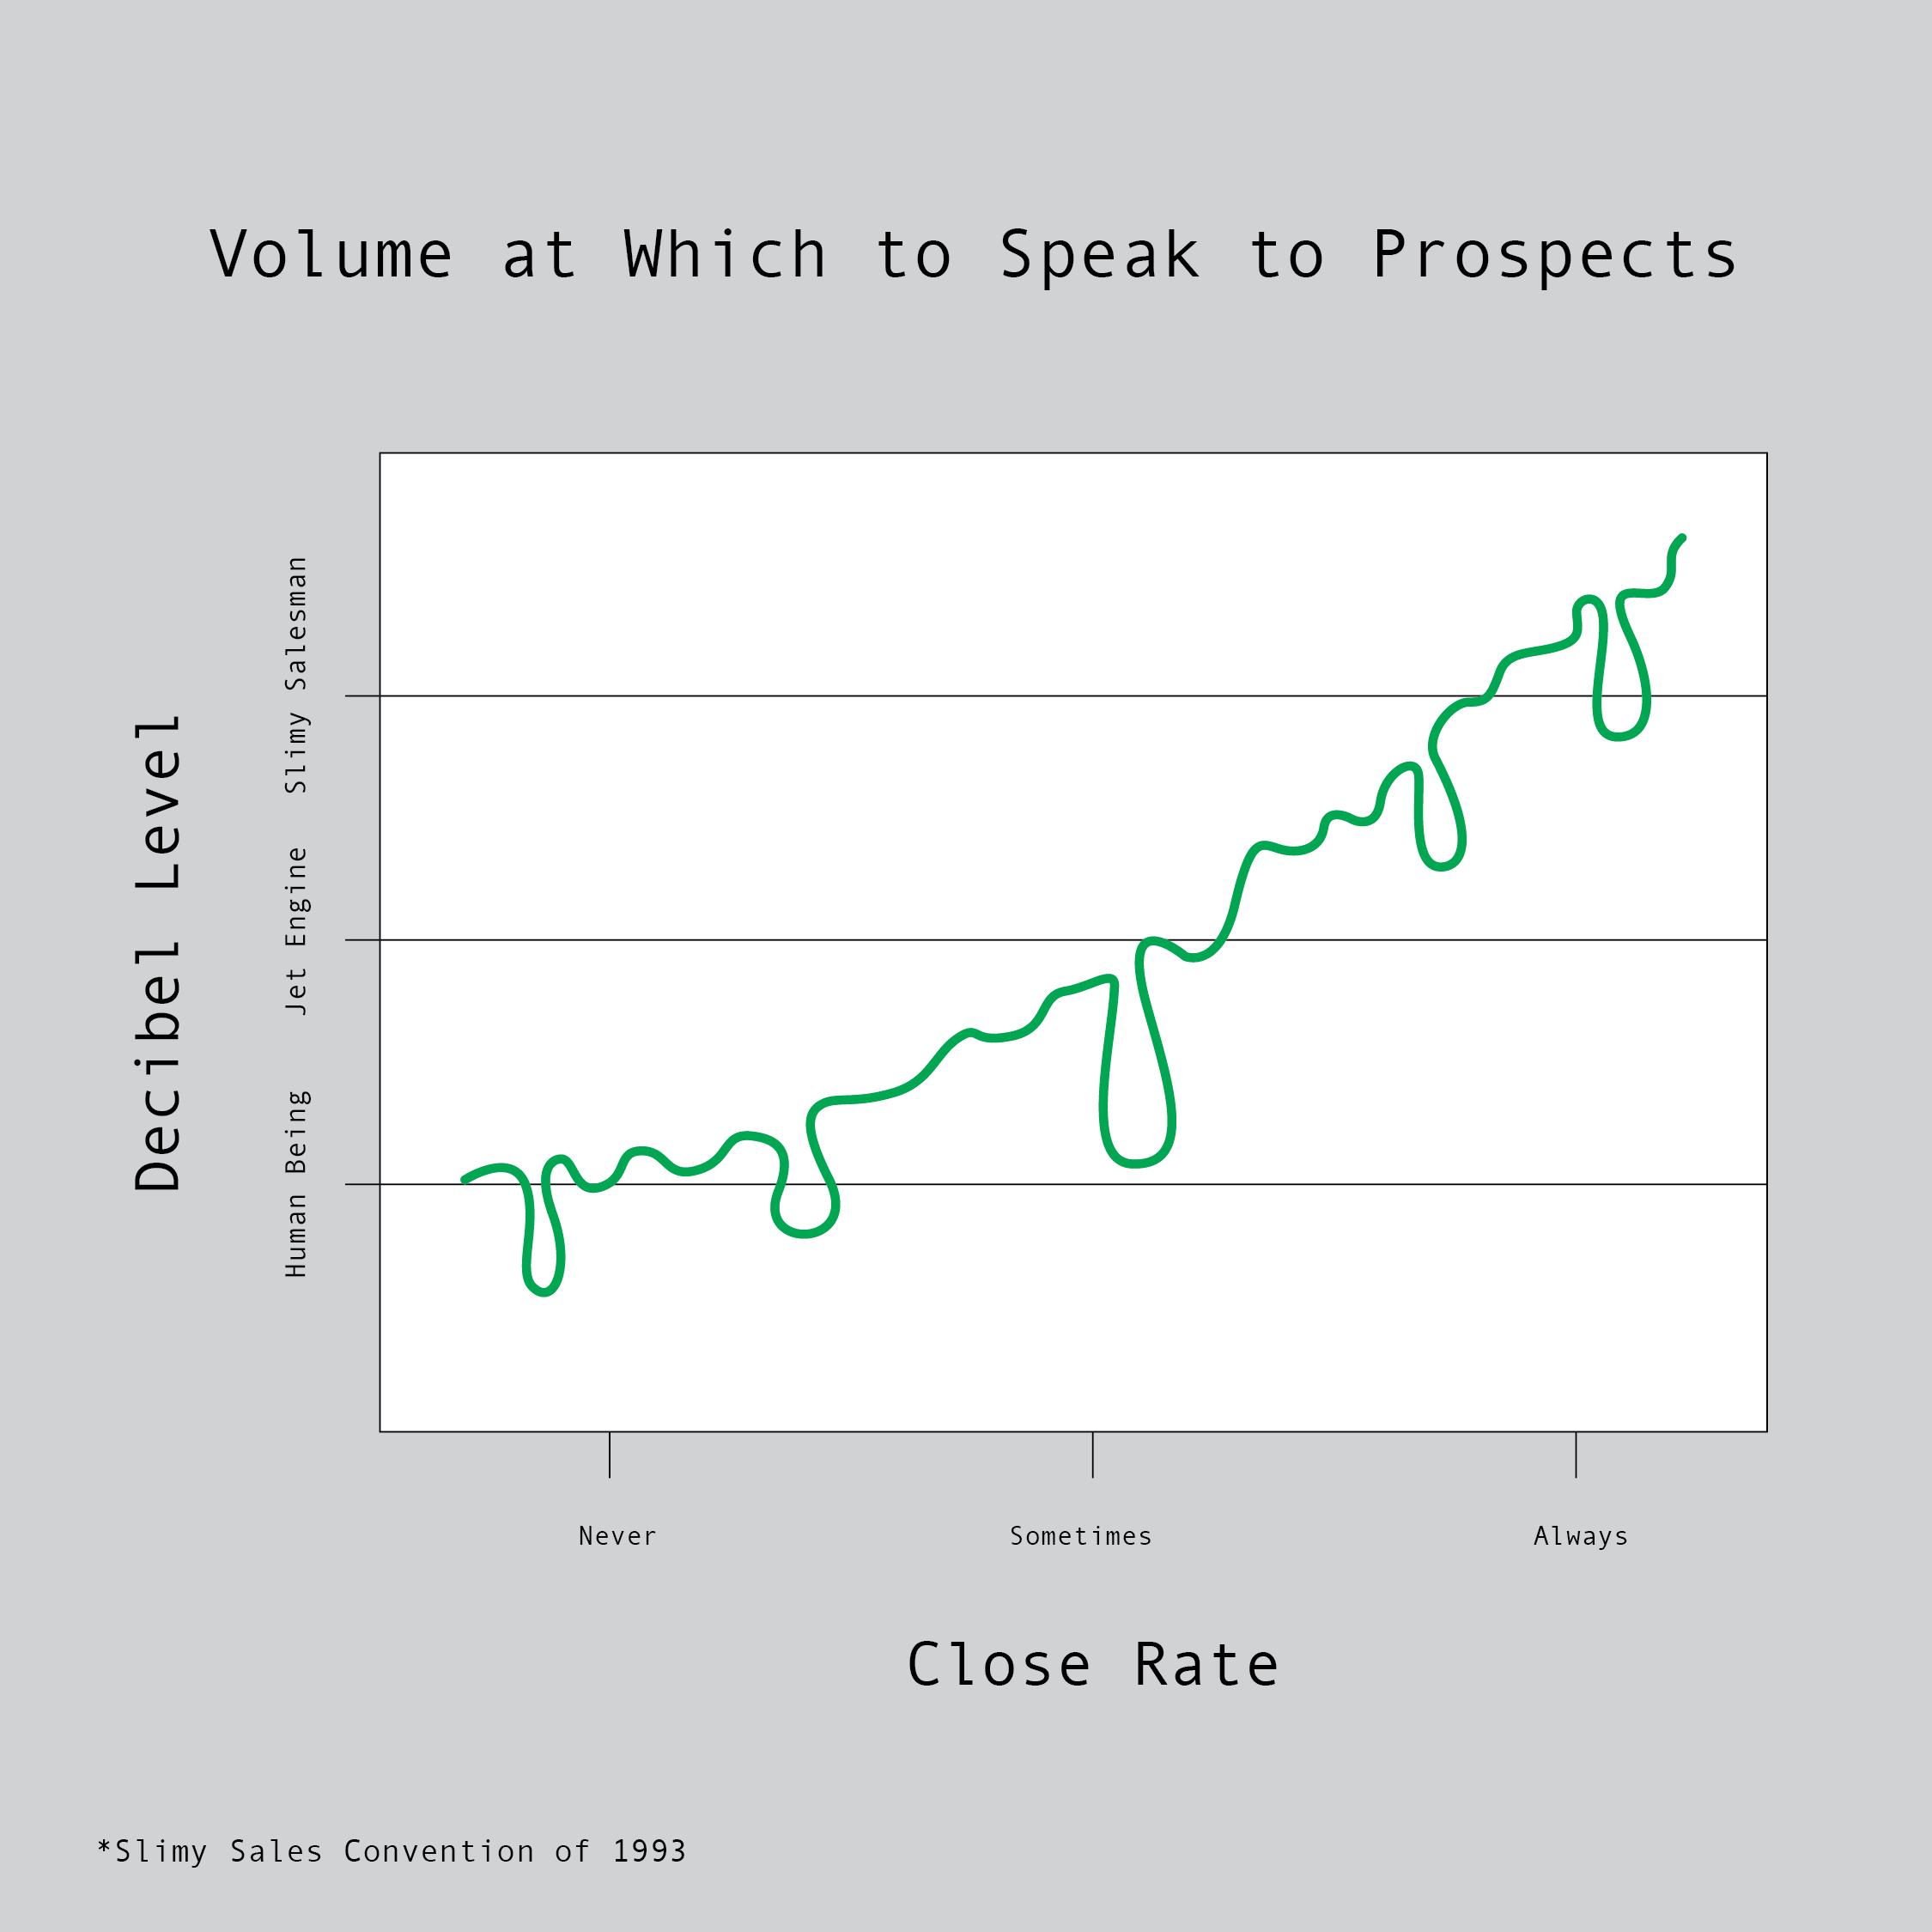 SlimySales_Charts_ChartsGraphs3-09.png